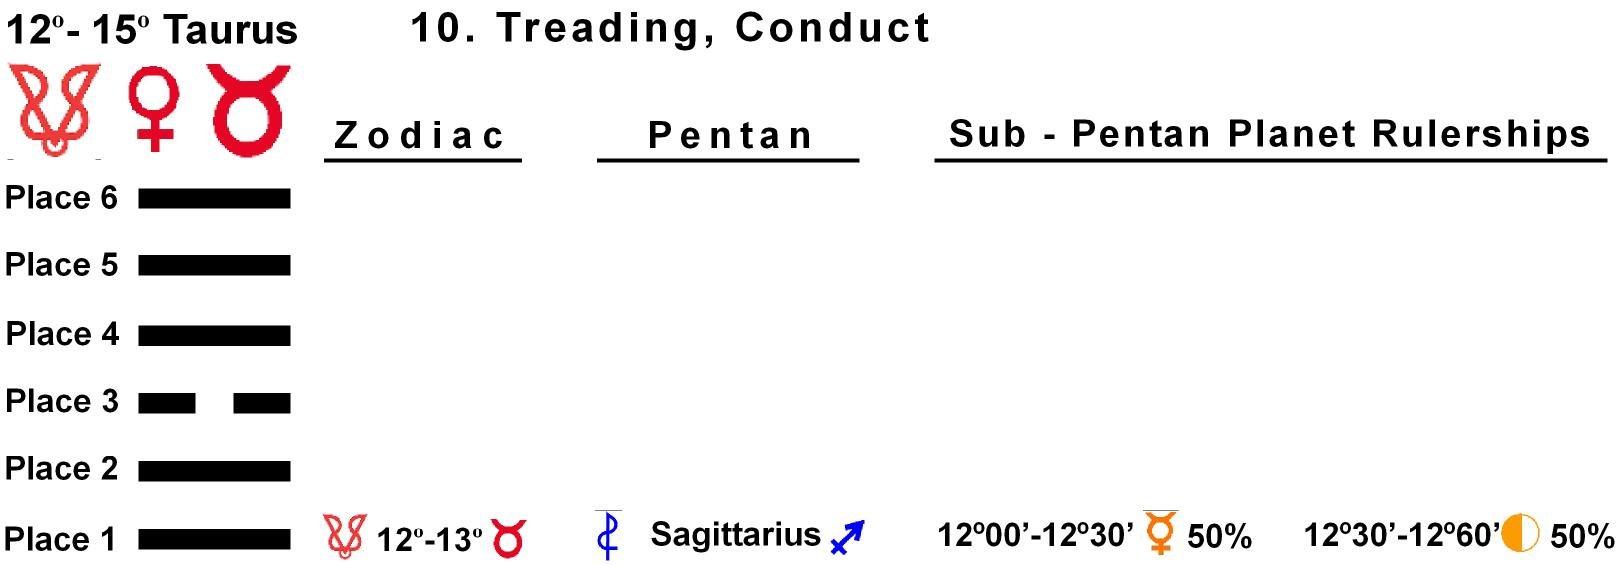 Pent-lines-02TA 12-13 Hx-10 Treading Conduct